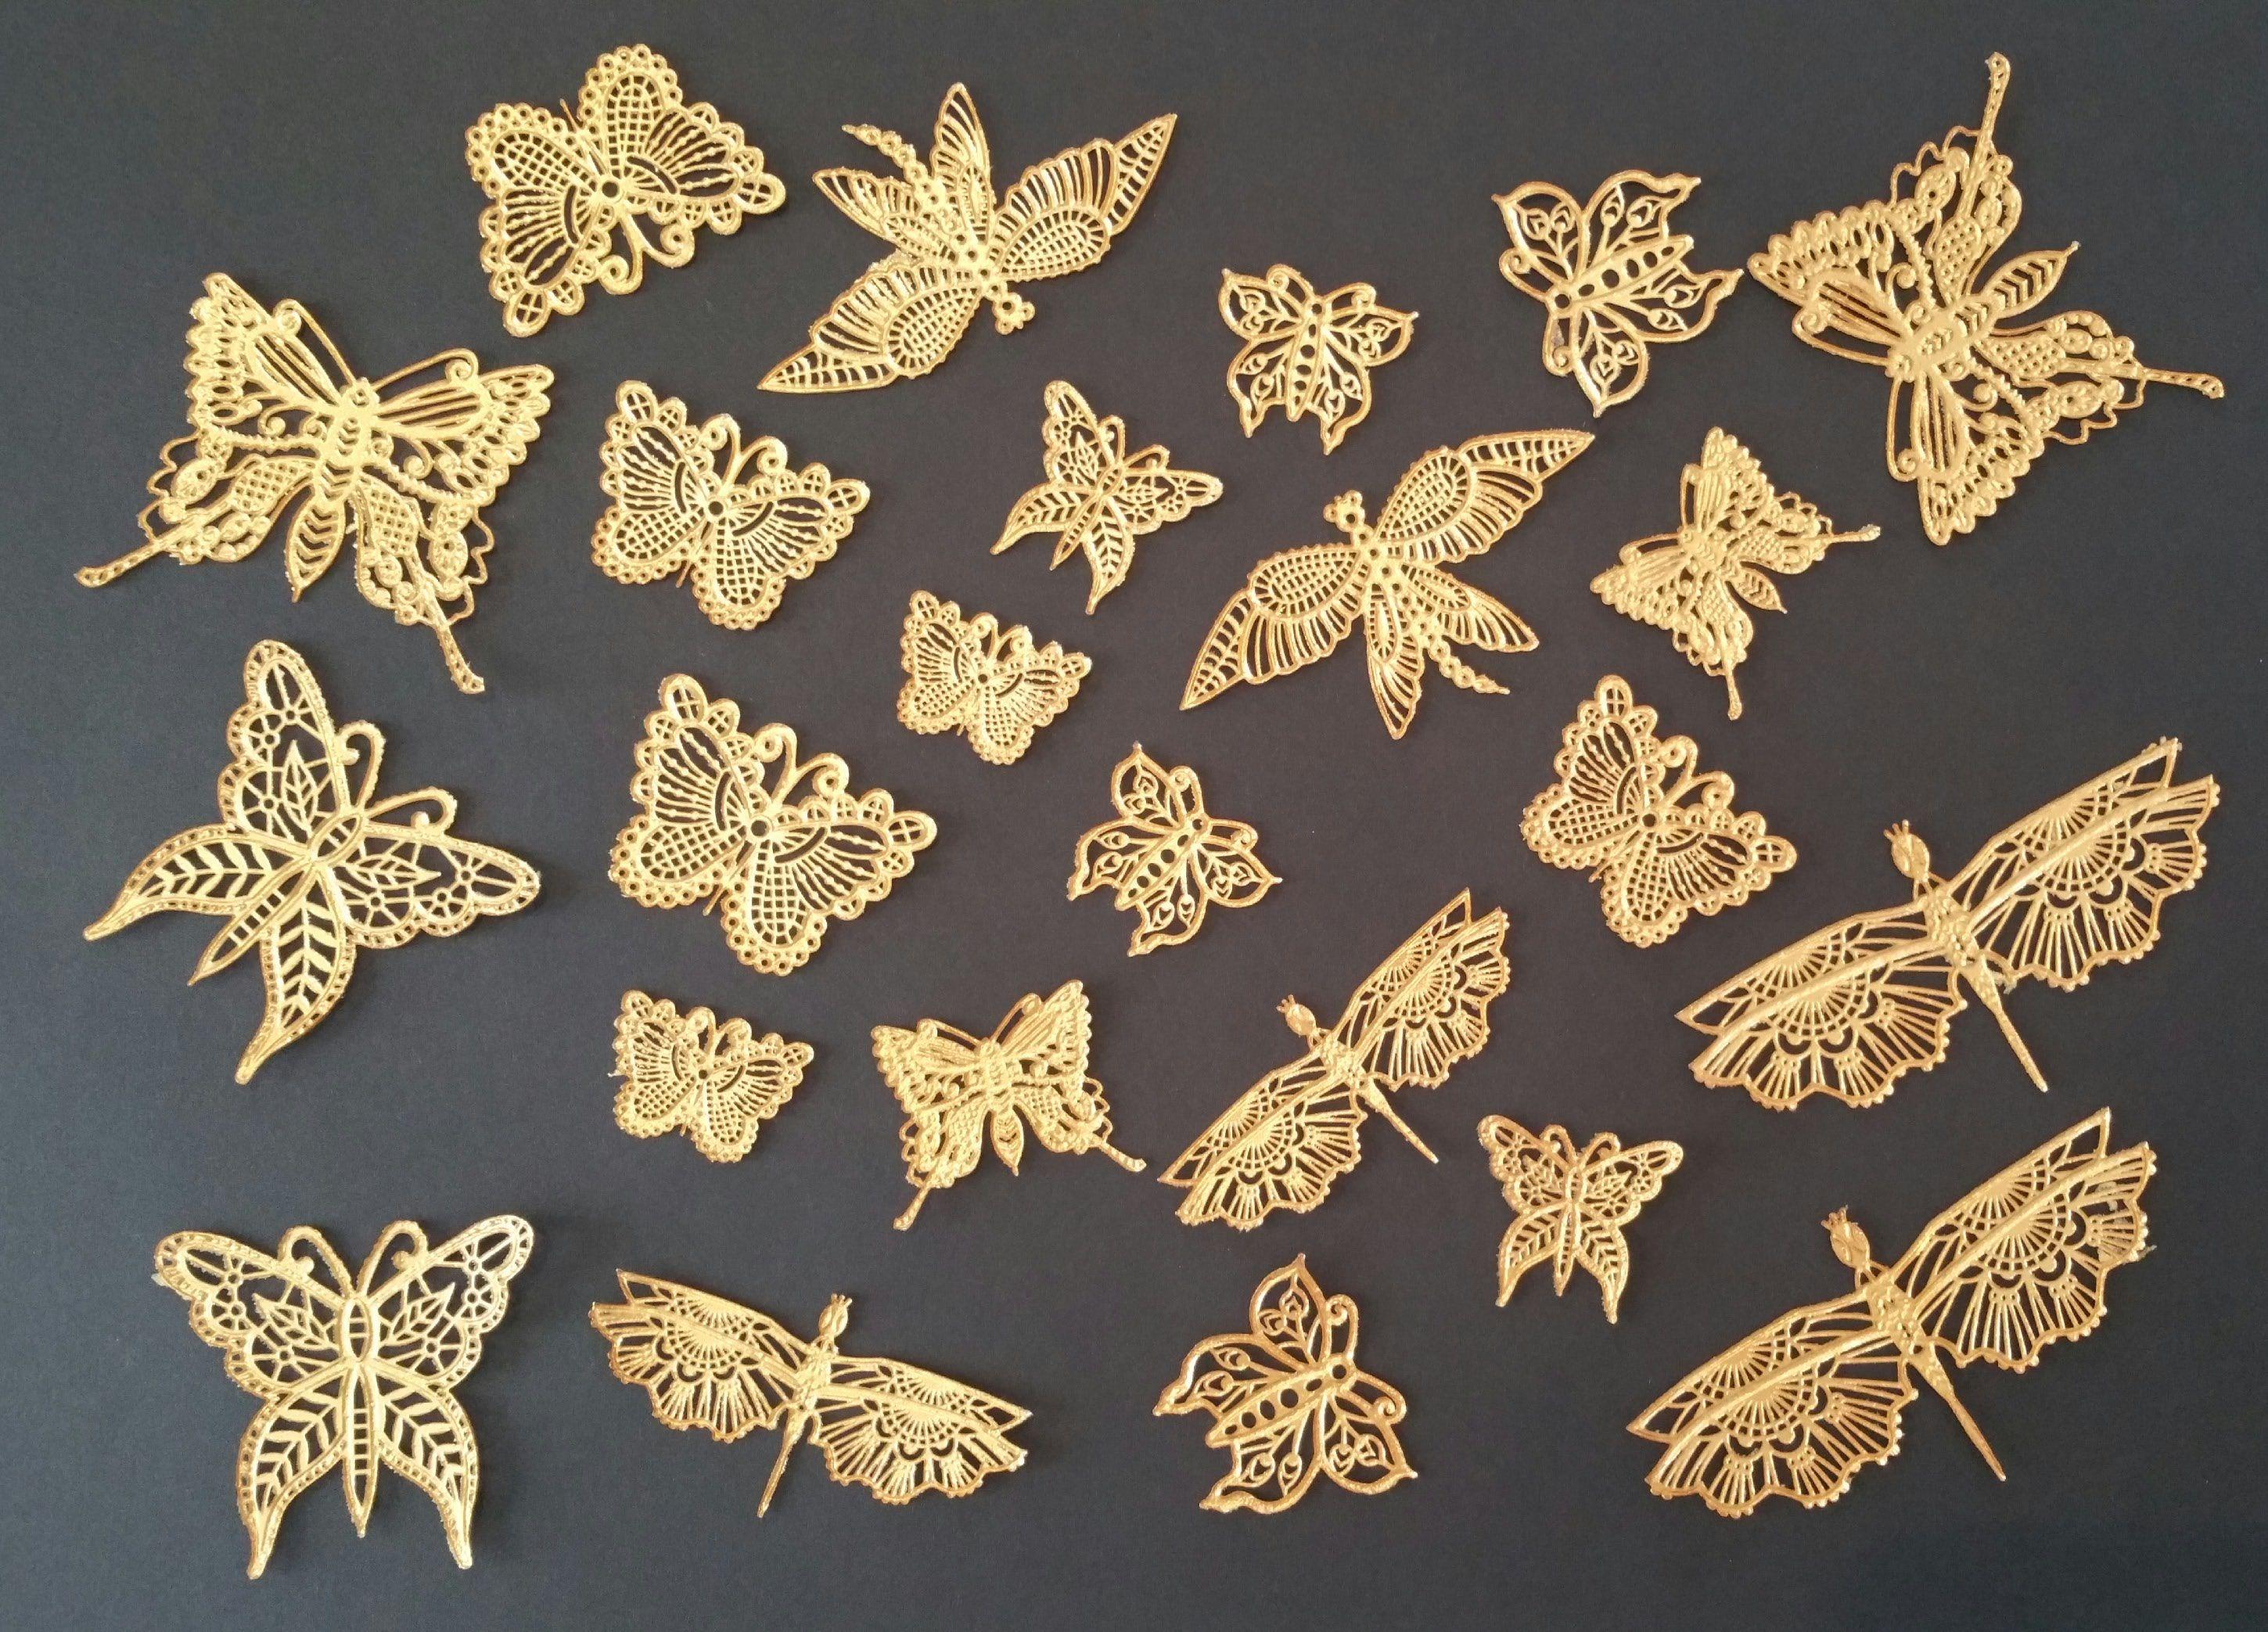 Goldene essbare Schmetterlinge